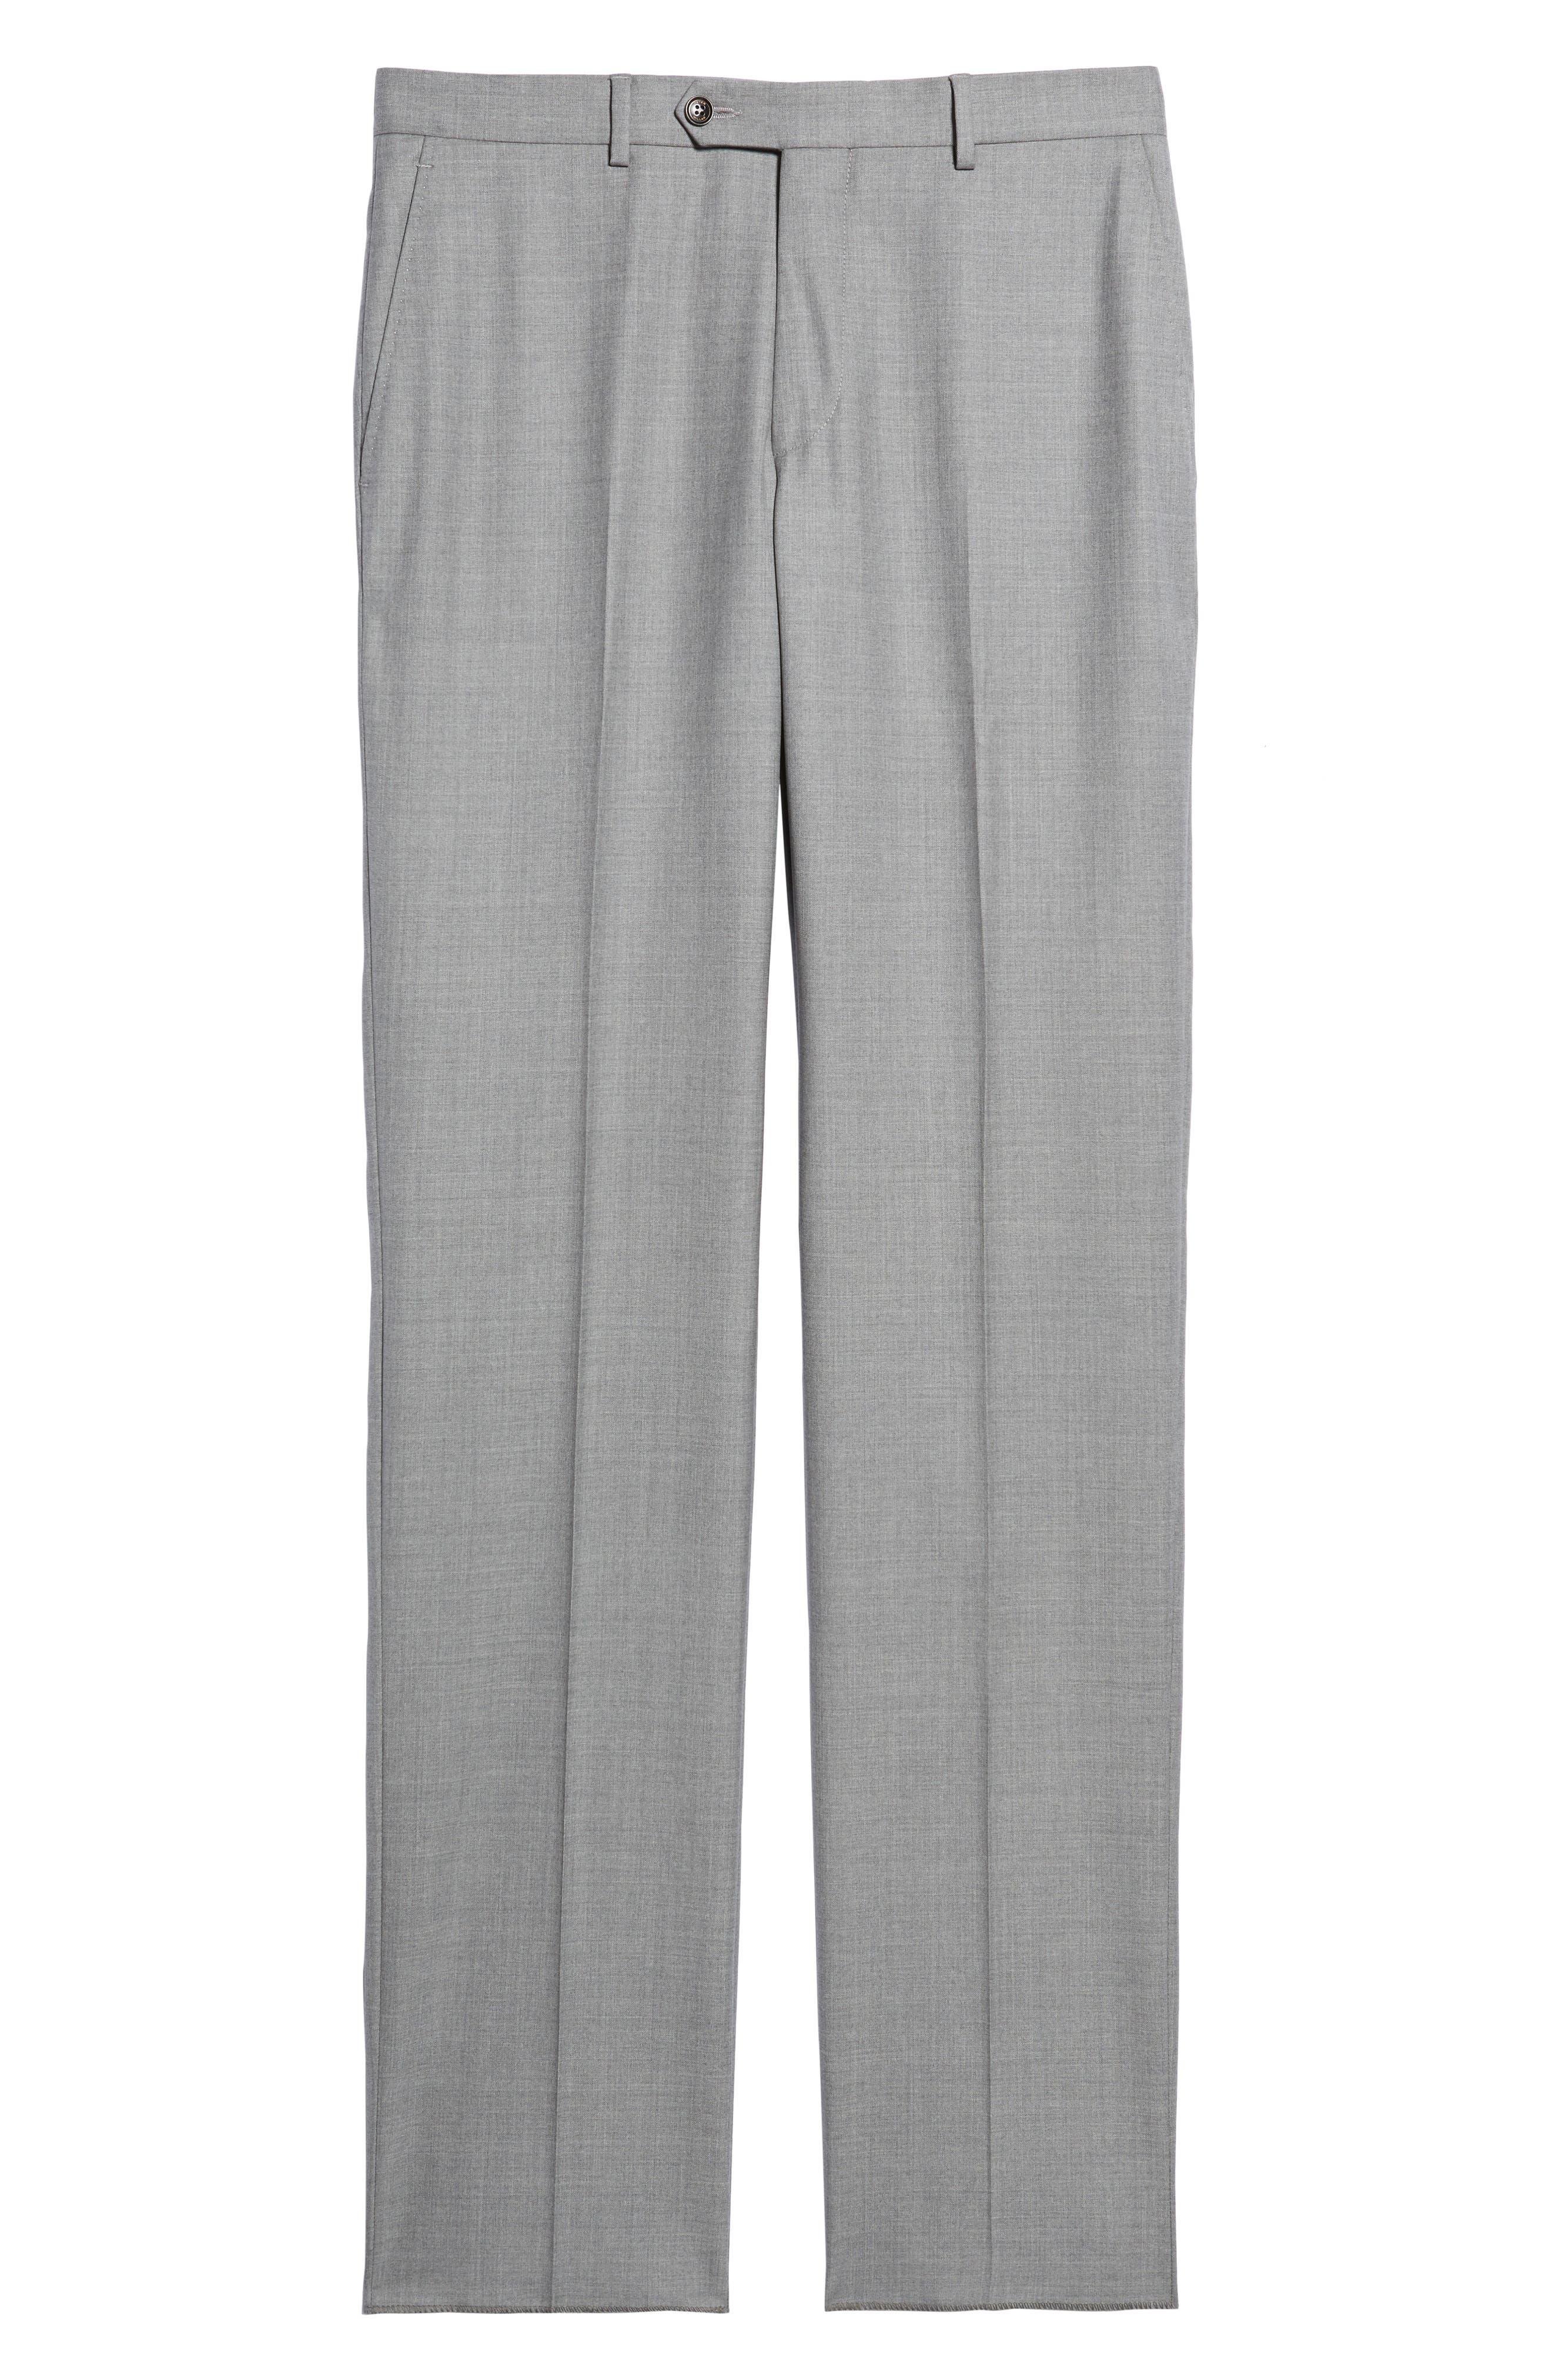 Peter Millar Multi Season Super 150s Wool Flat Front Trousers,                             Alternate thumbnail 6, color,                             047